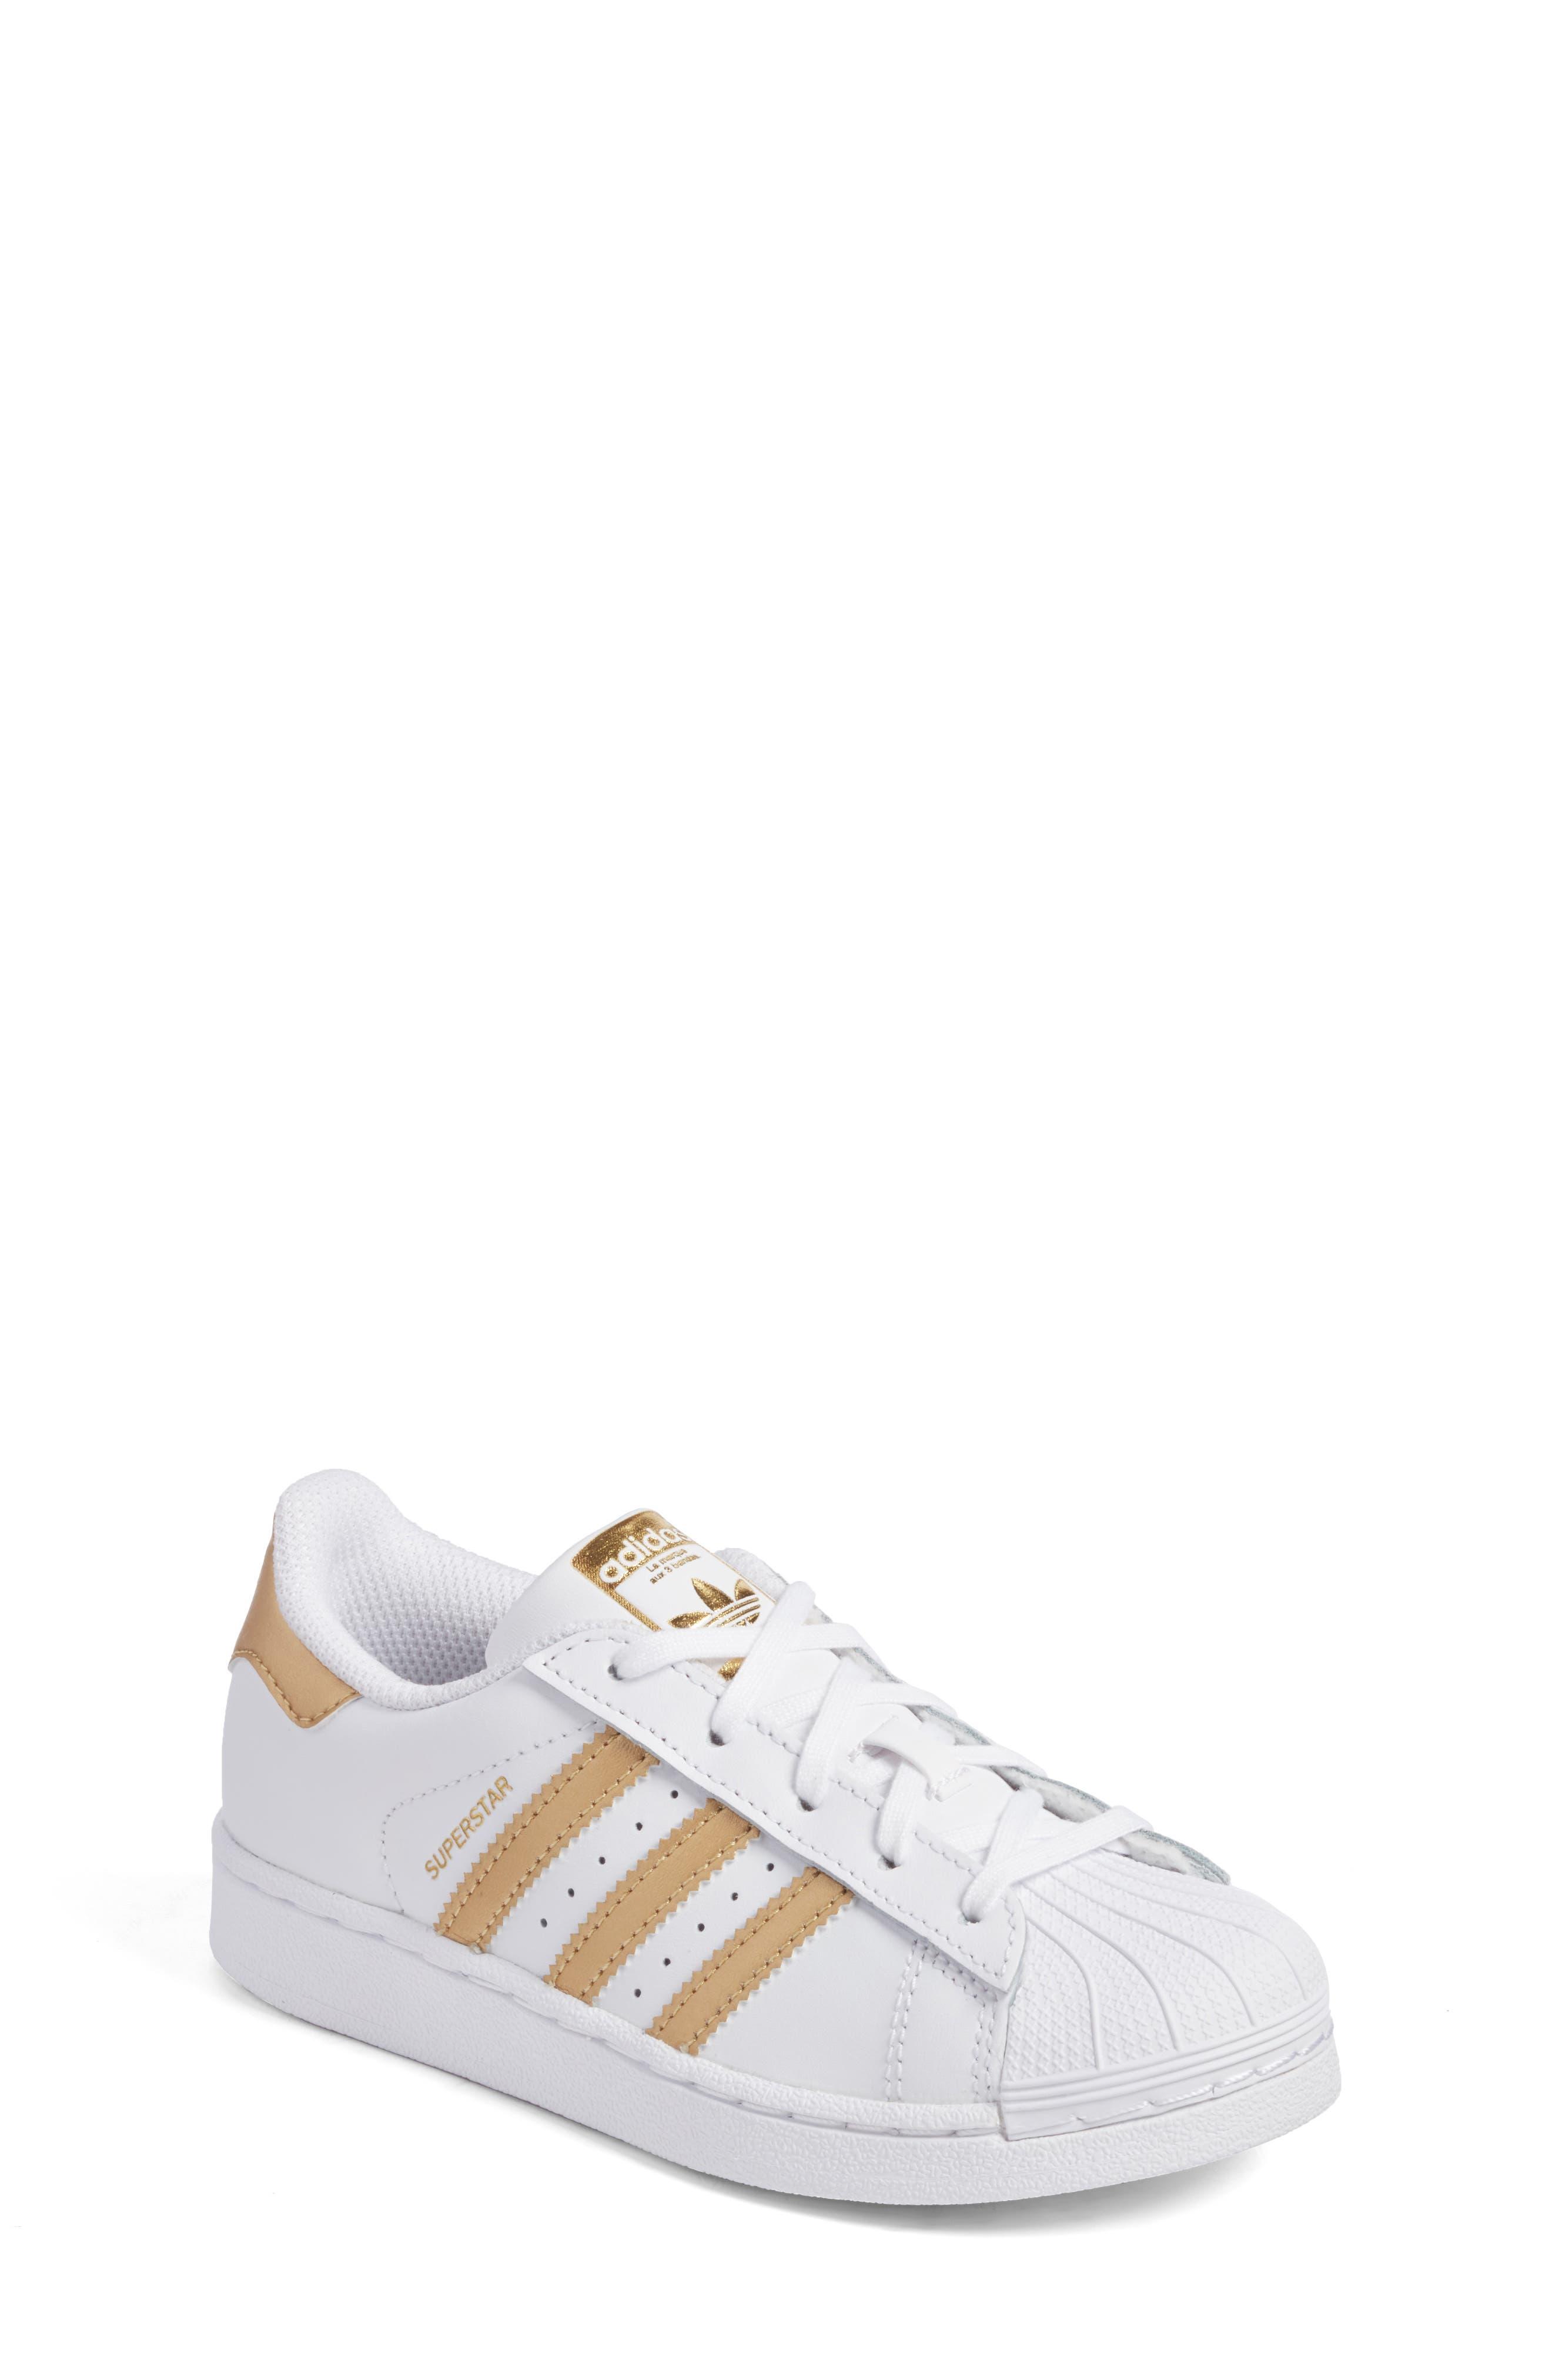 Alternate Image 1 Selected - adidas Superstar C Sneaker (Toddler & Little Kid)